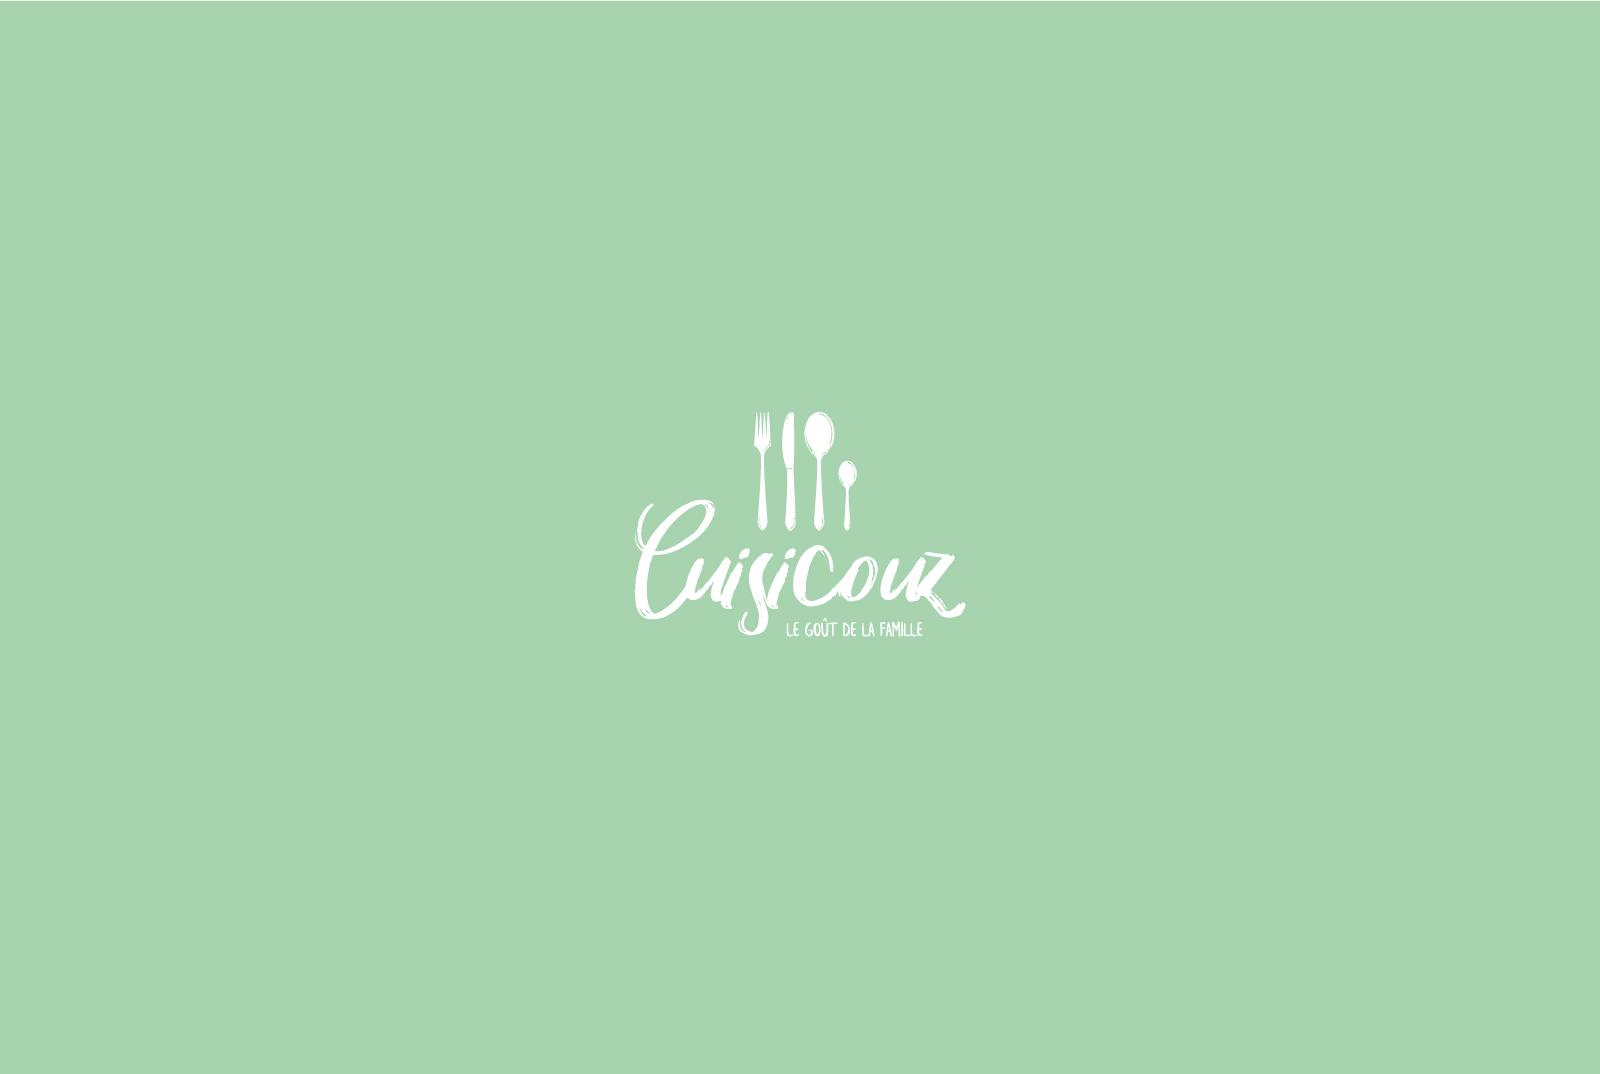 Cuisicouz-Presentation-Portfolio_B1-01.jpg